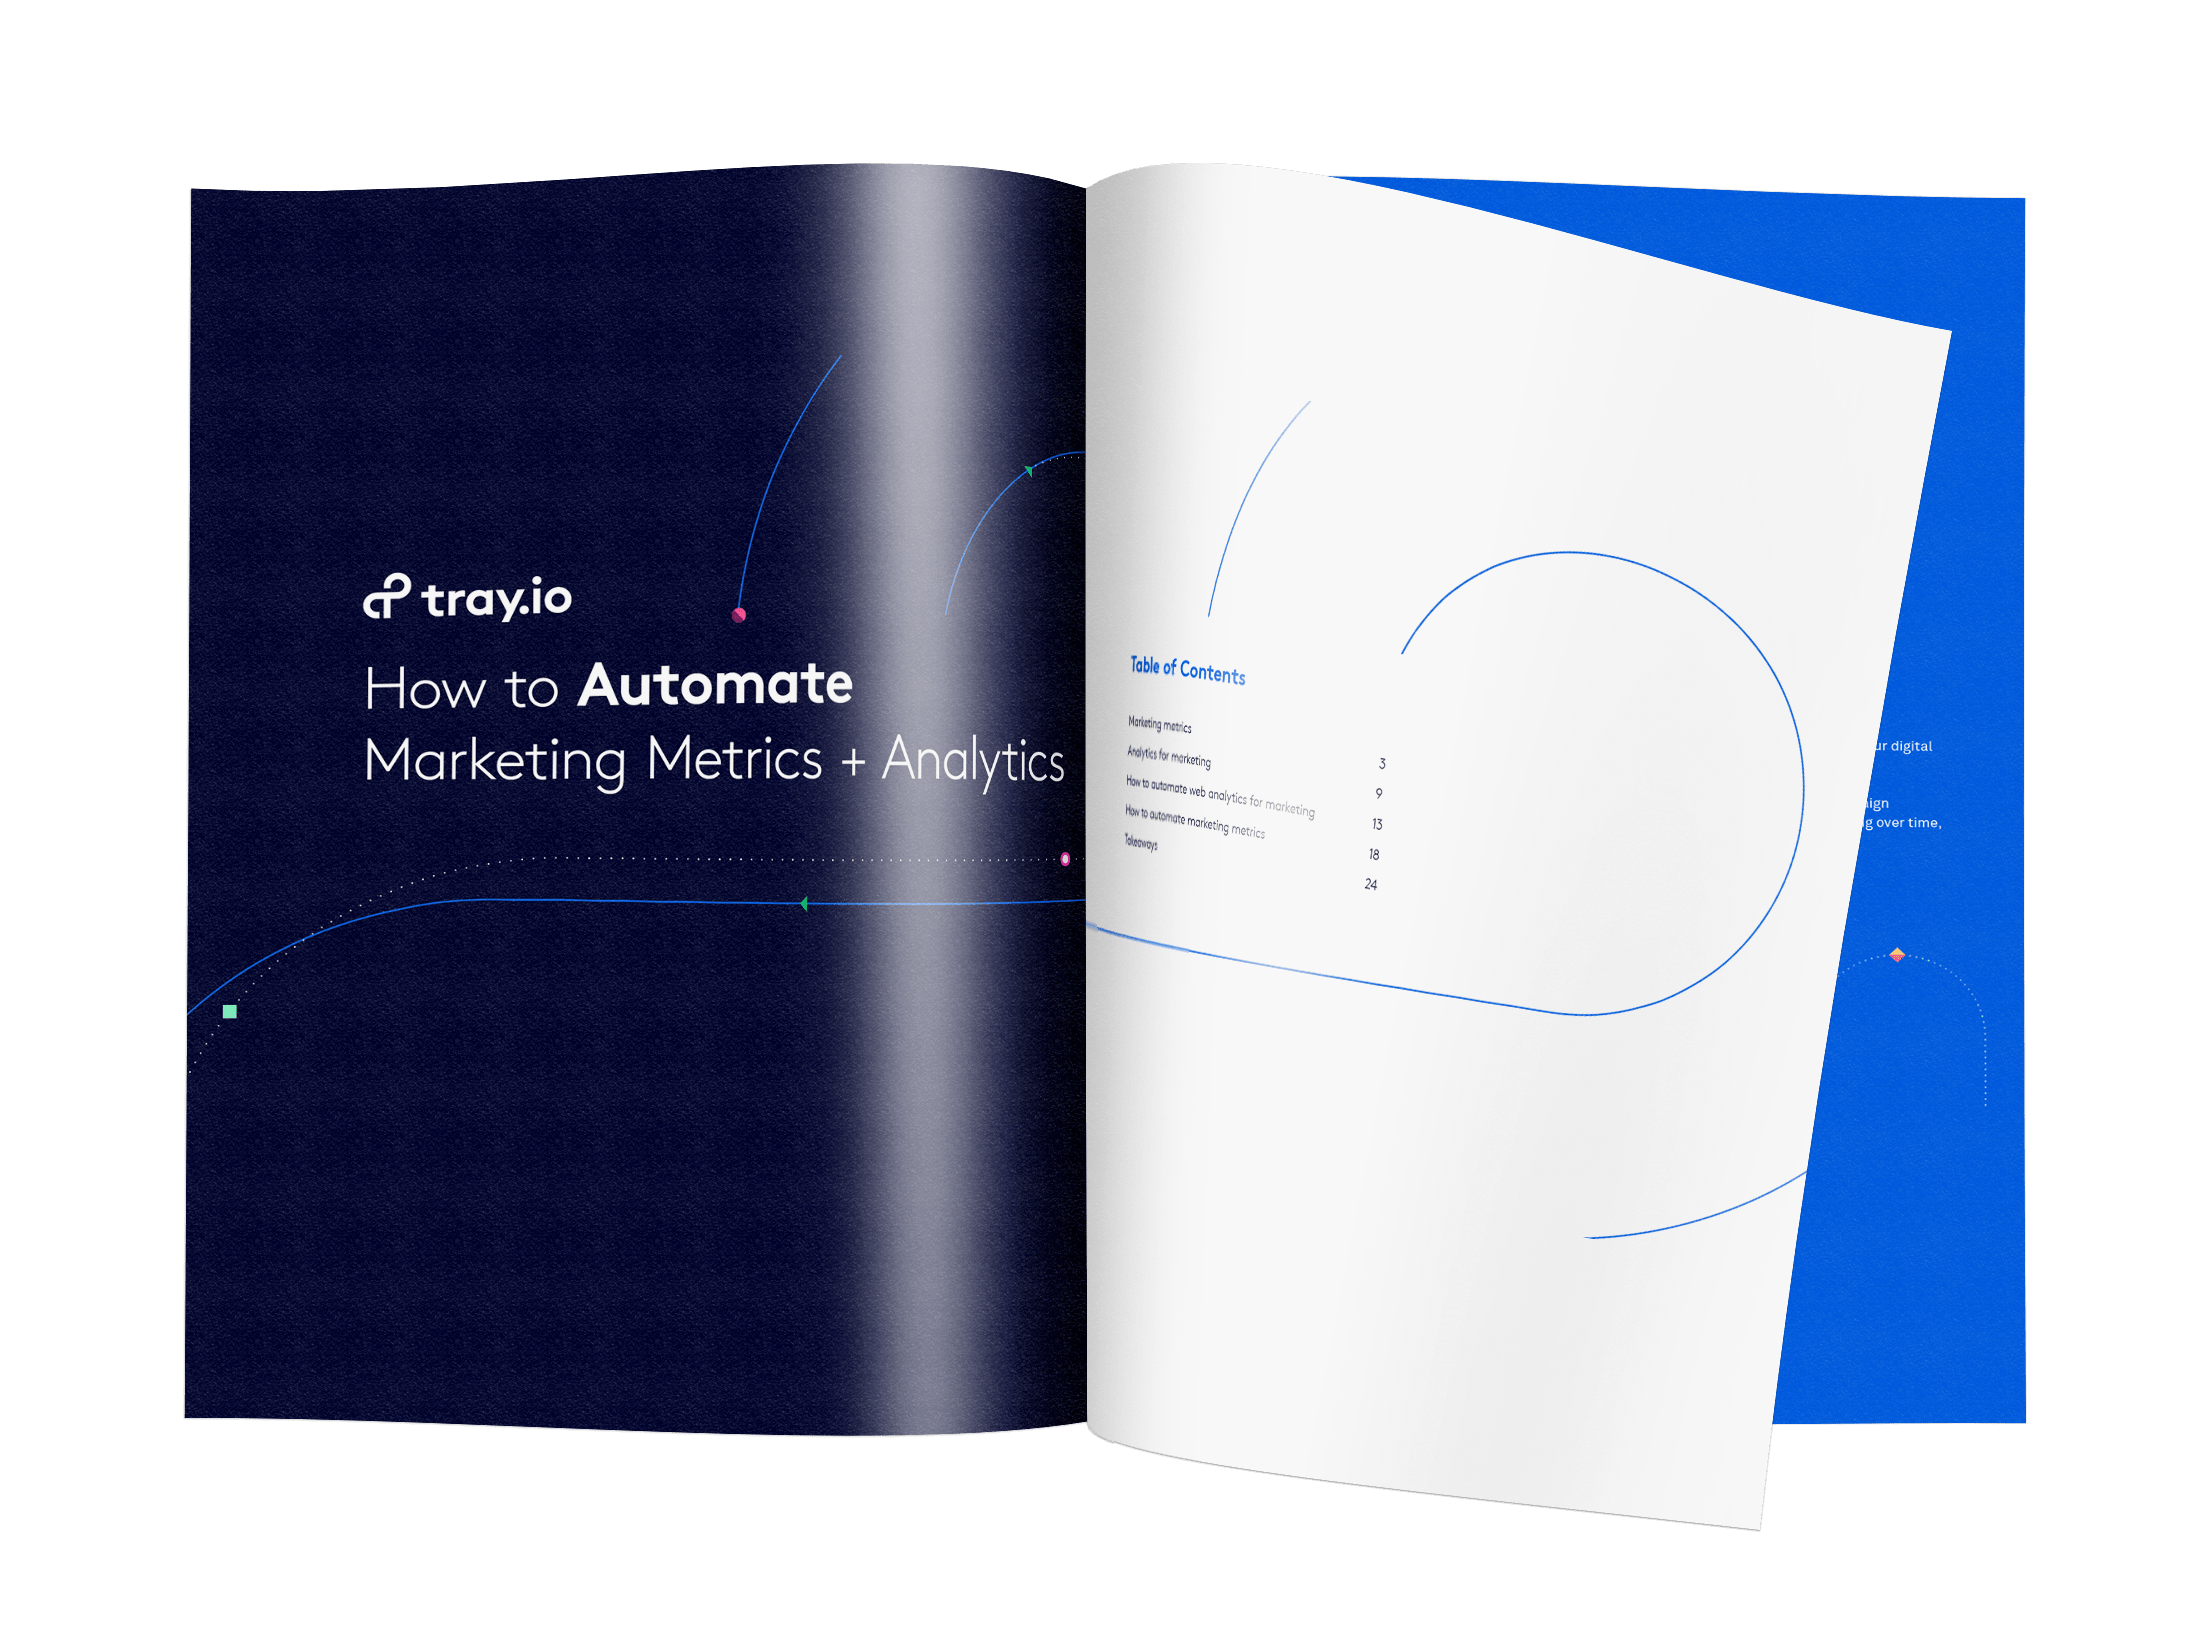 How-to-automate-marketing-metrics-analytics-guide